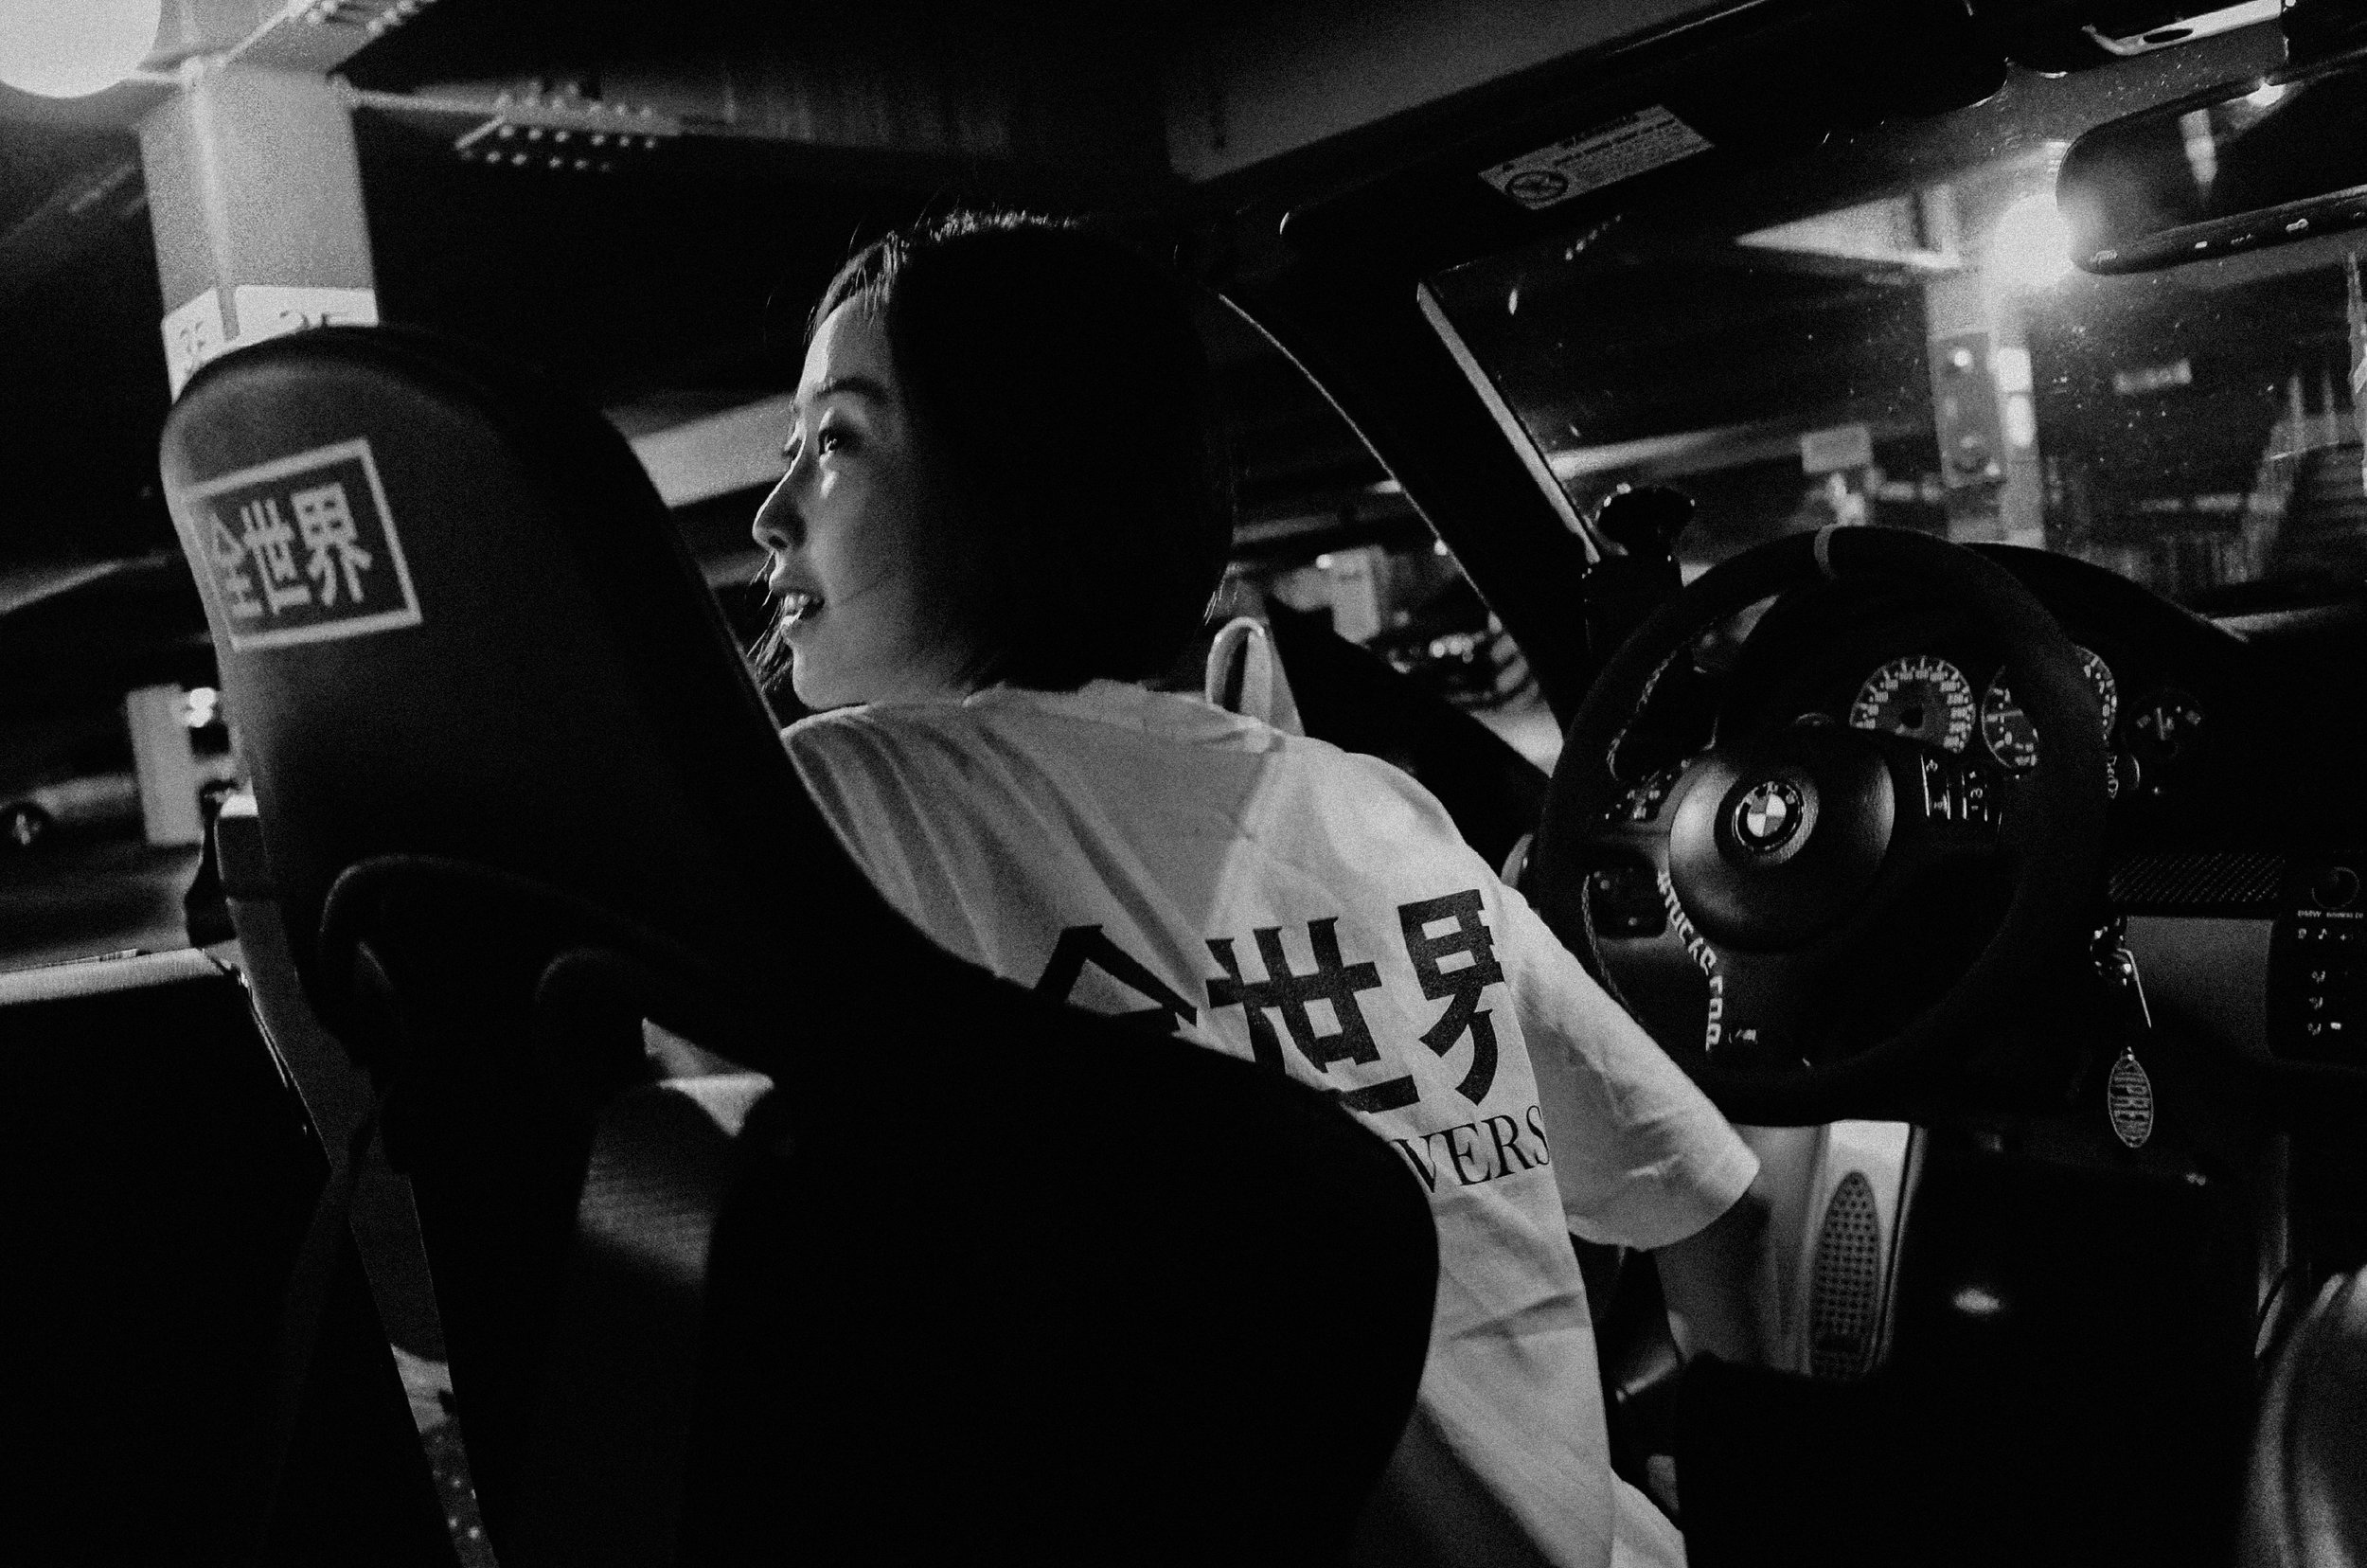 [Peaches] E46 Night-out - 全世界-2.jpg